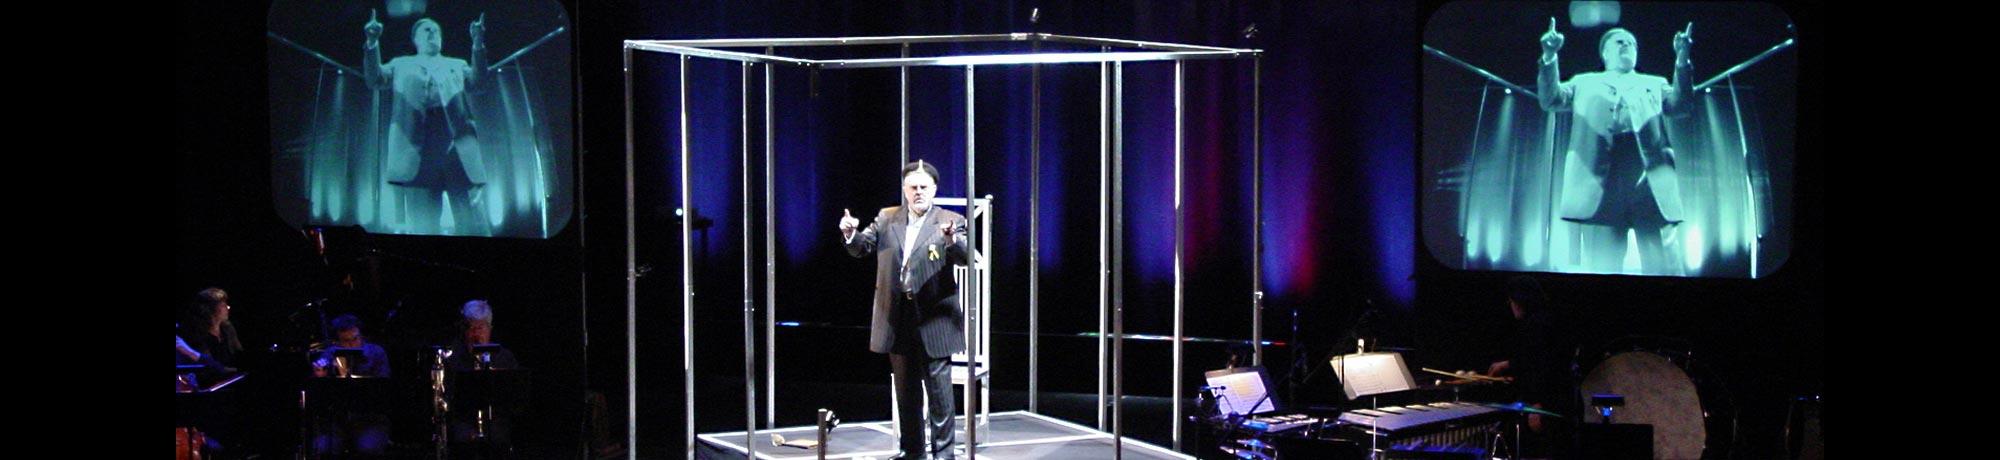 Paul Dresher - Musical Theater